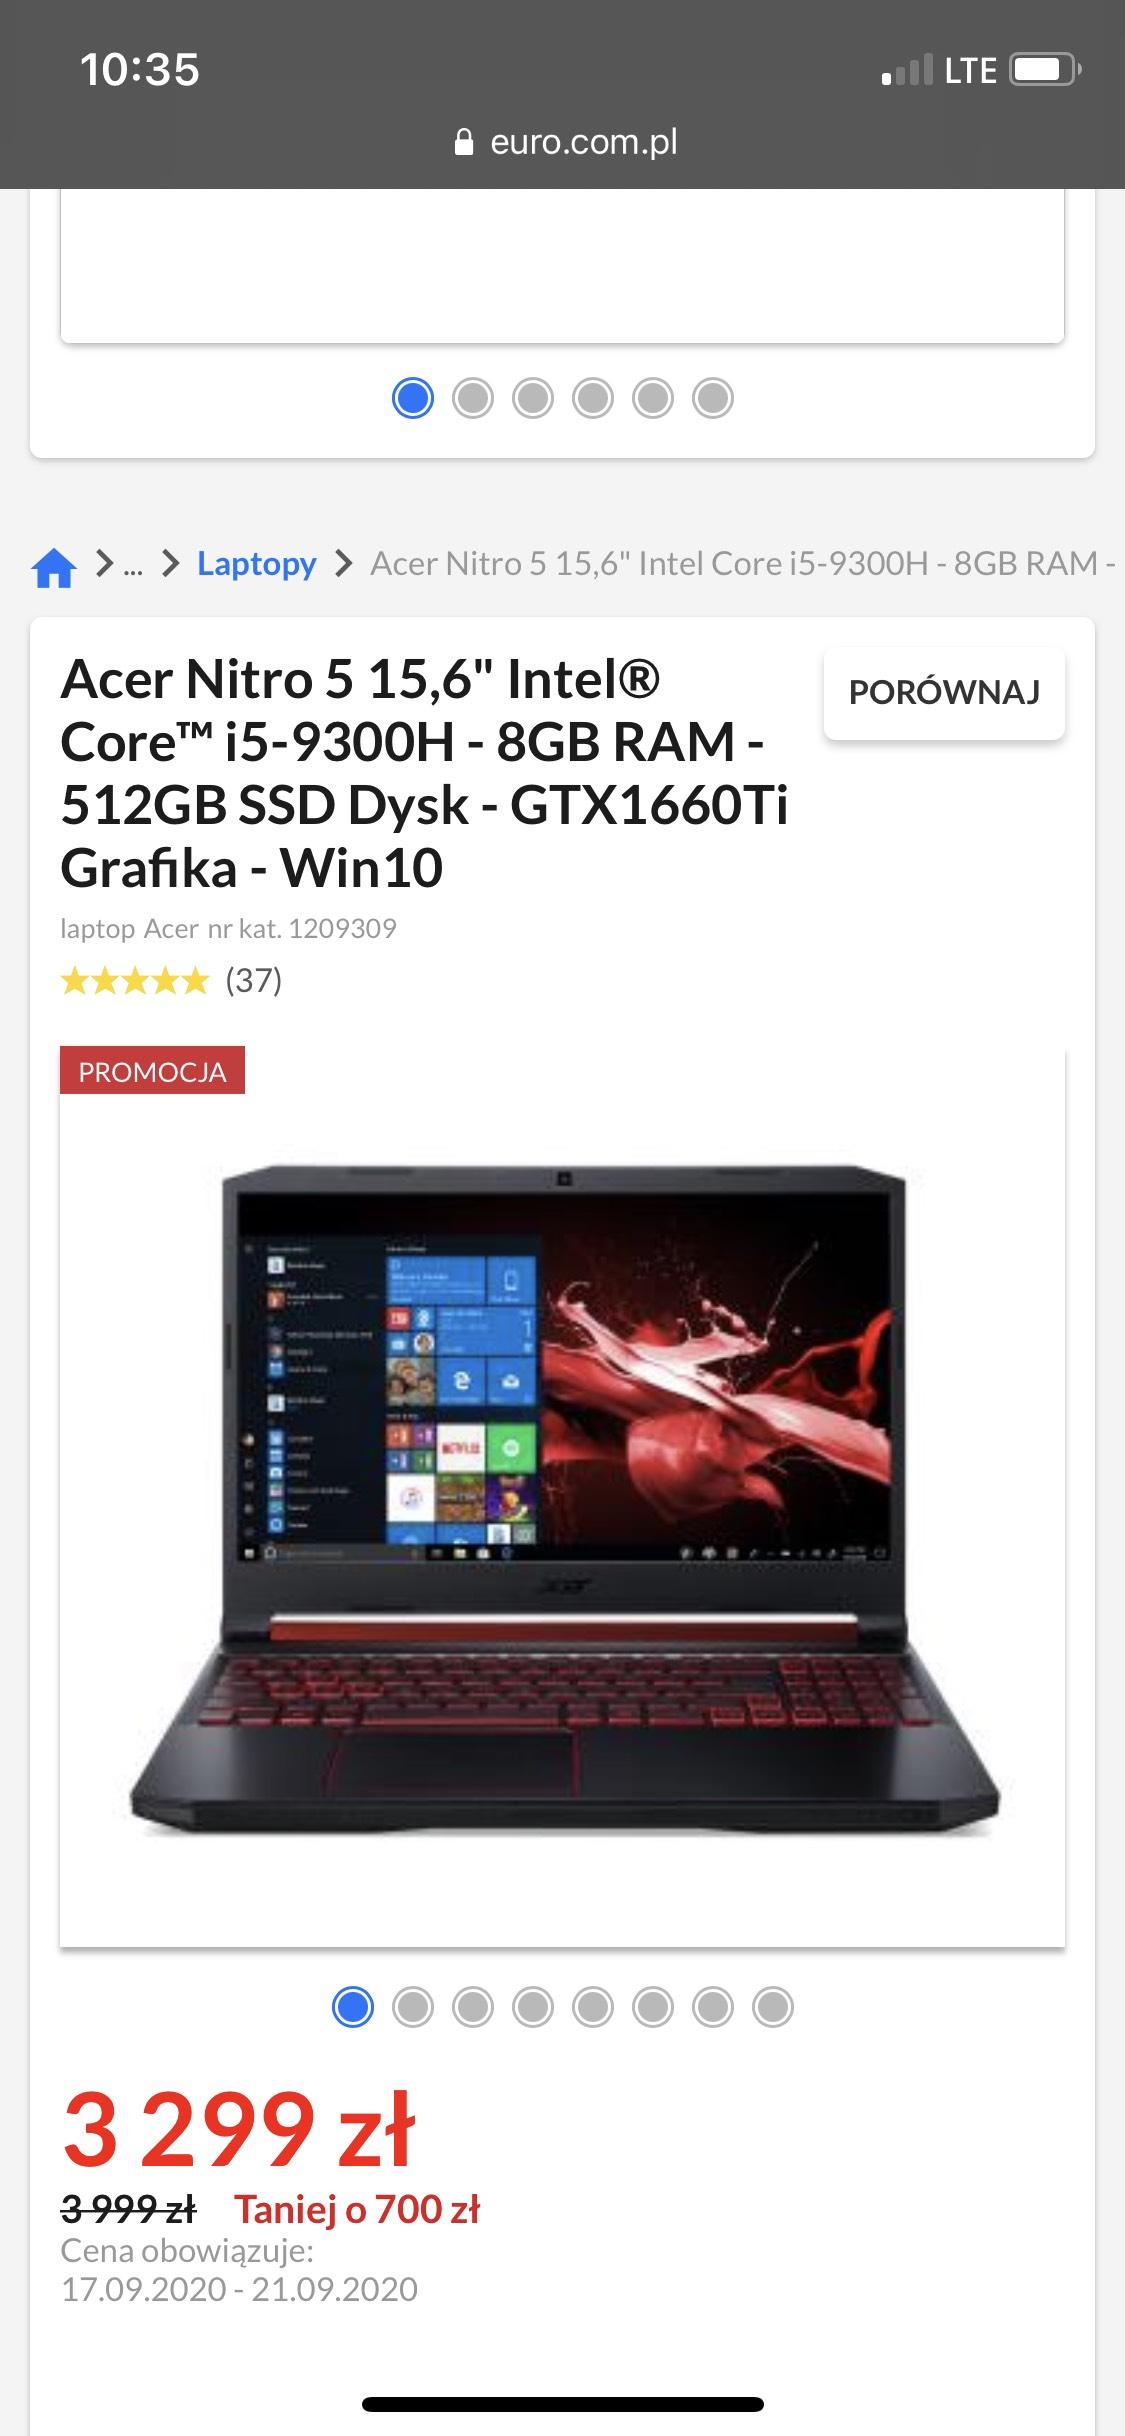 "Acer Nitro 5 15,6"" Intel® Core™ i5-9300H - 8GB RAM - 512GB SSD Dysk - GTX1660Ti Grafika - Win10"